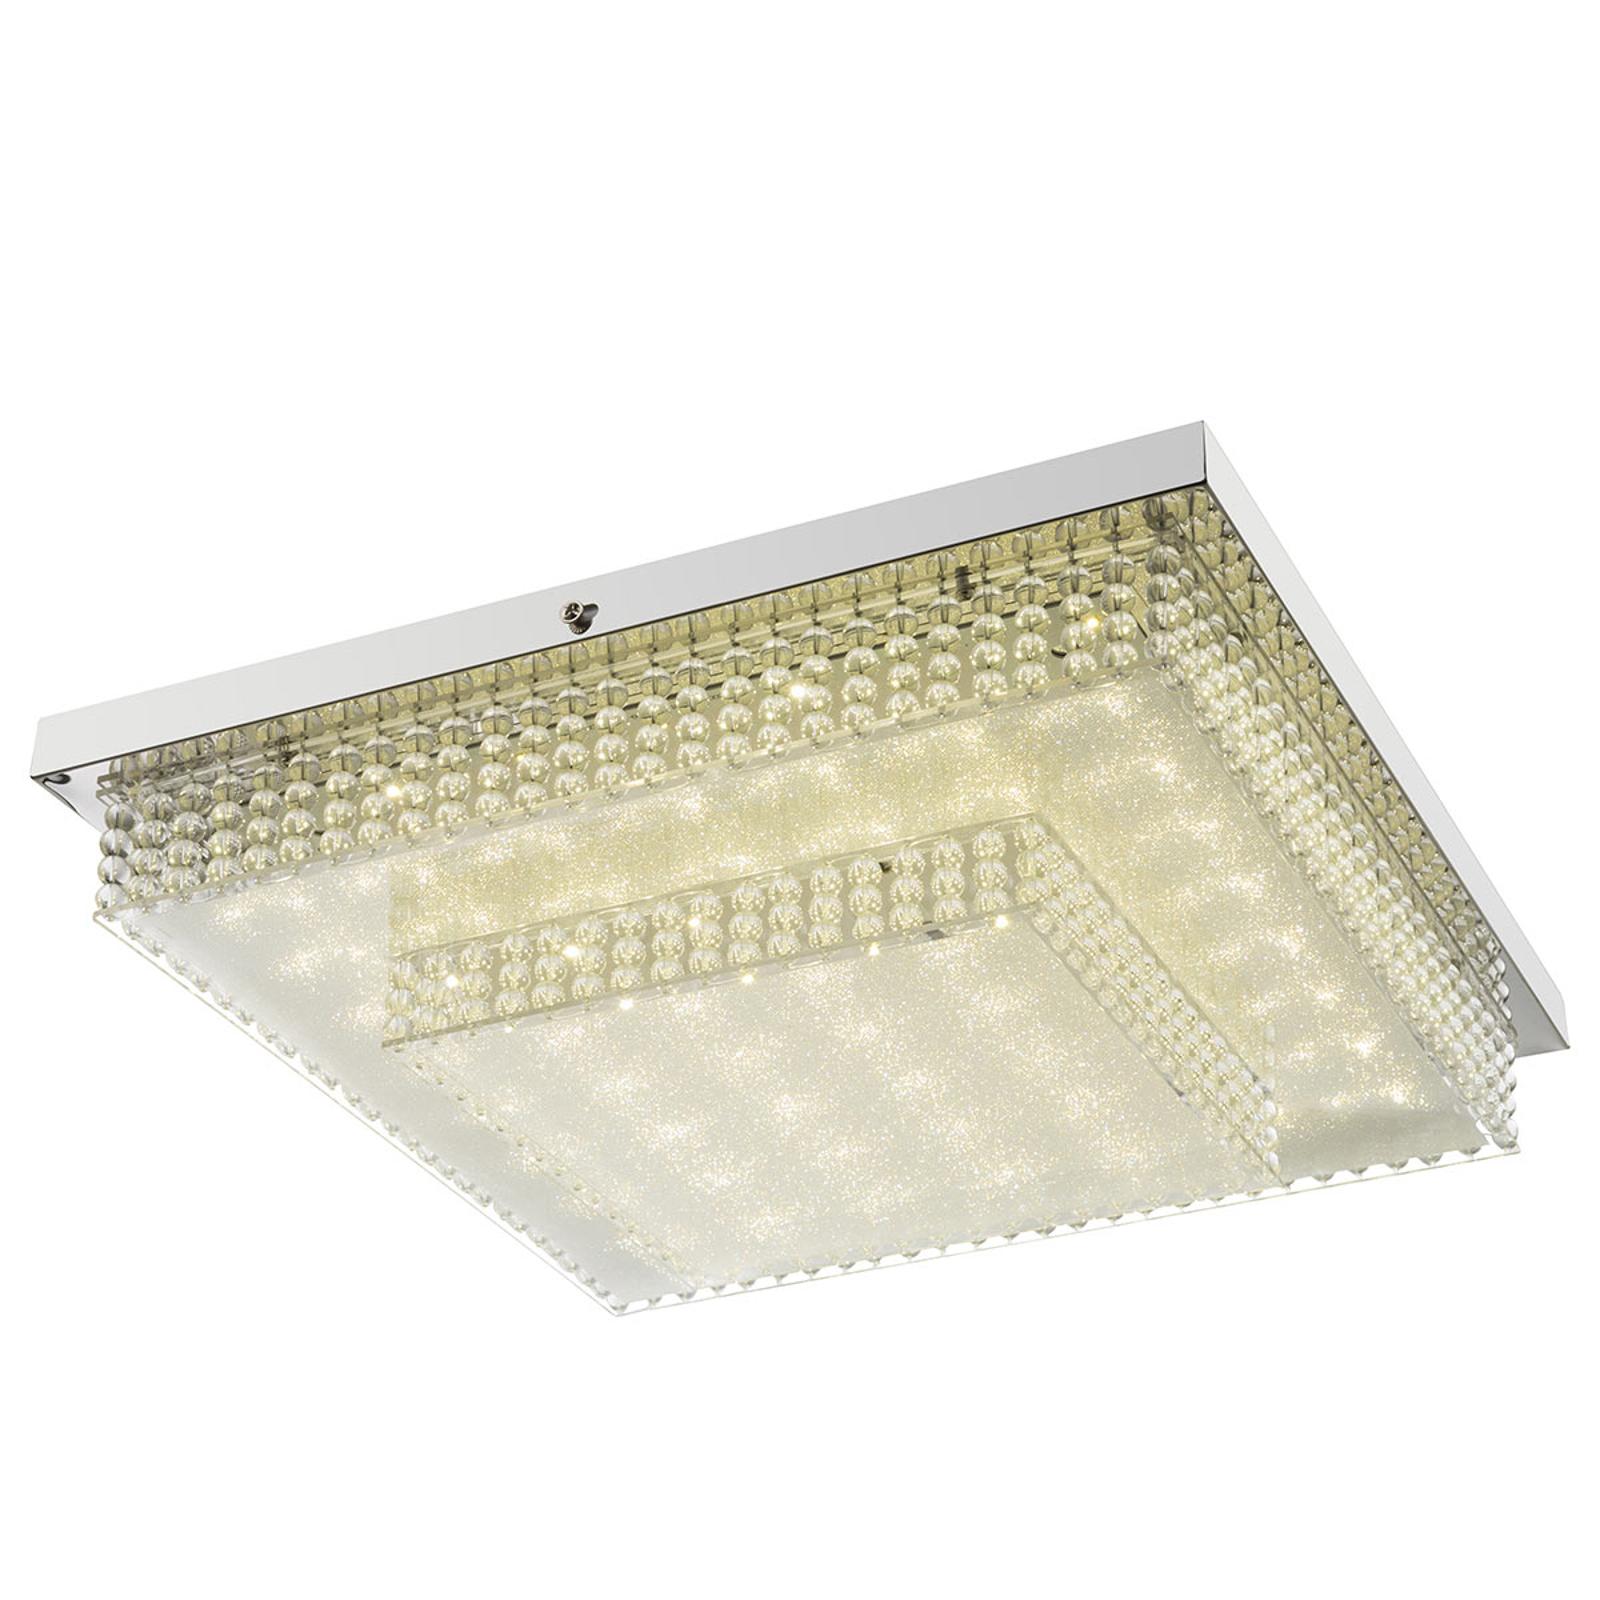 Cake I - hoekige LED plafondlamp met effectfolie